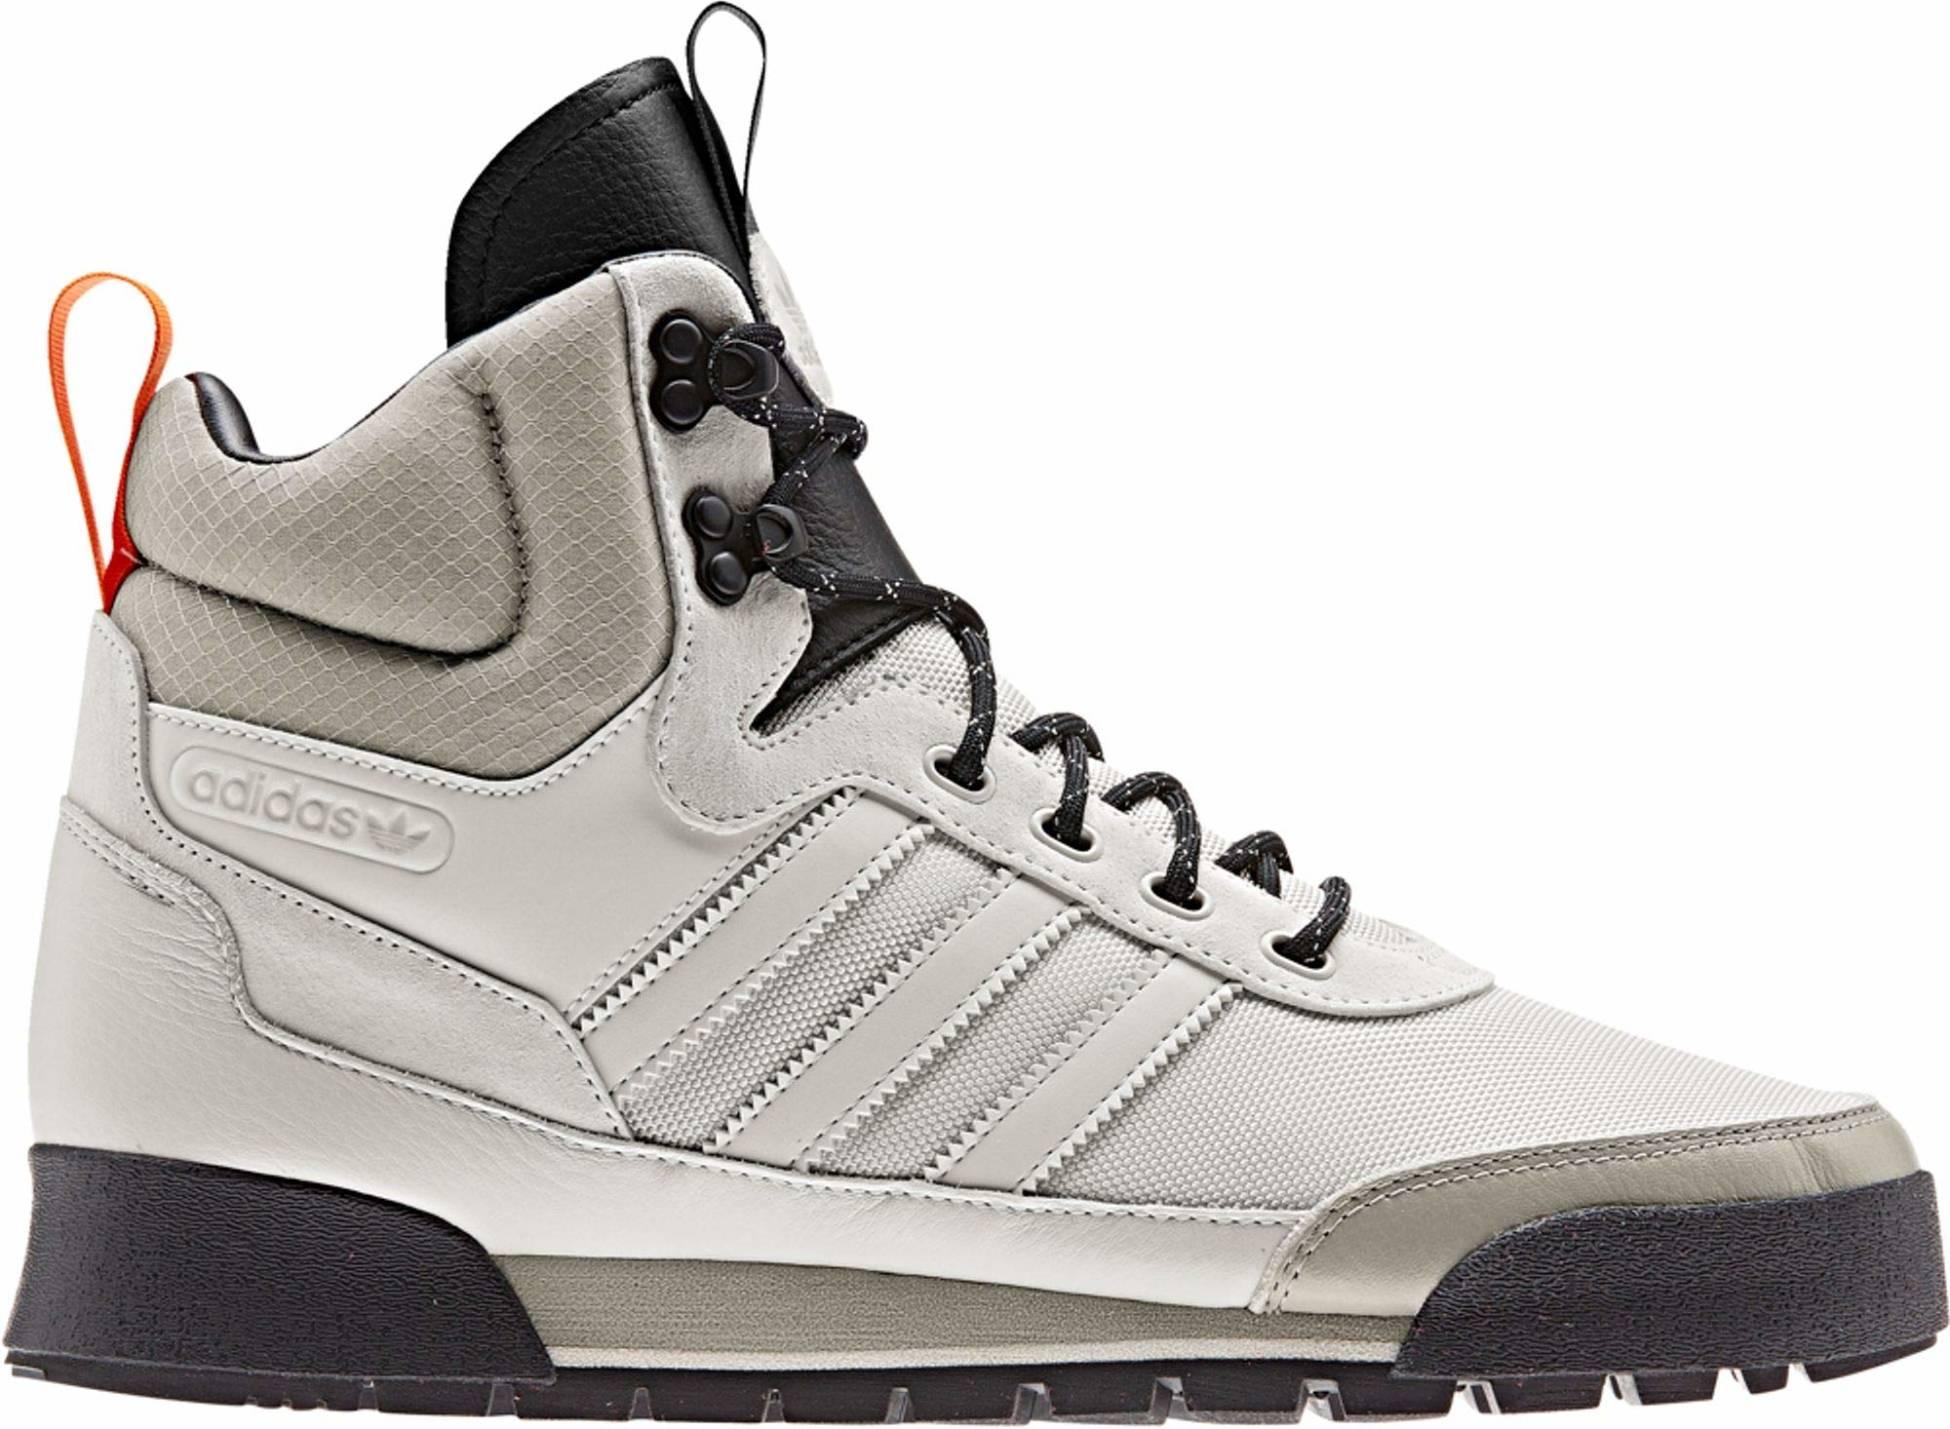 Humano vertical Buena suerte  Save 59% on Adidas High Top Sneakers (39 Models in Stock) | RunRepeat